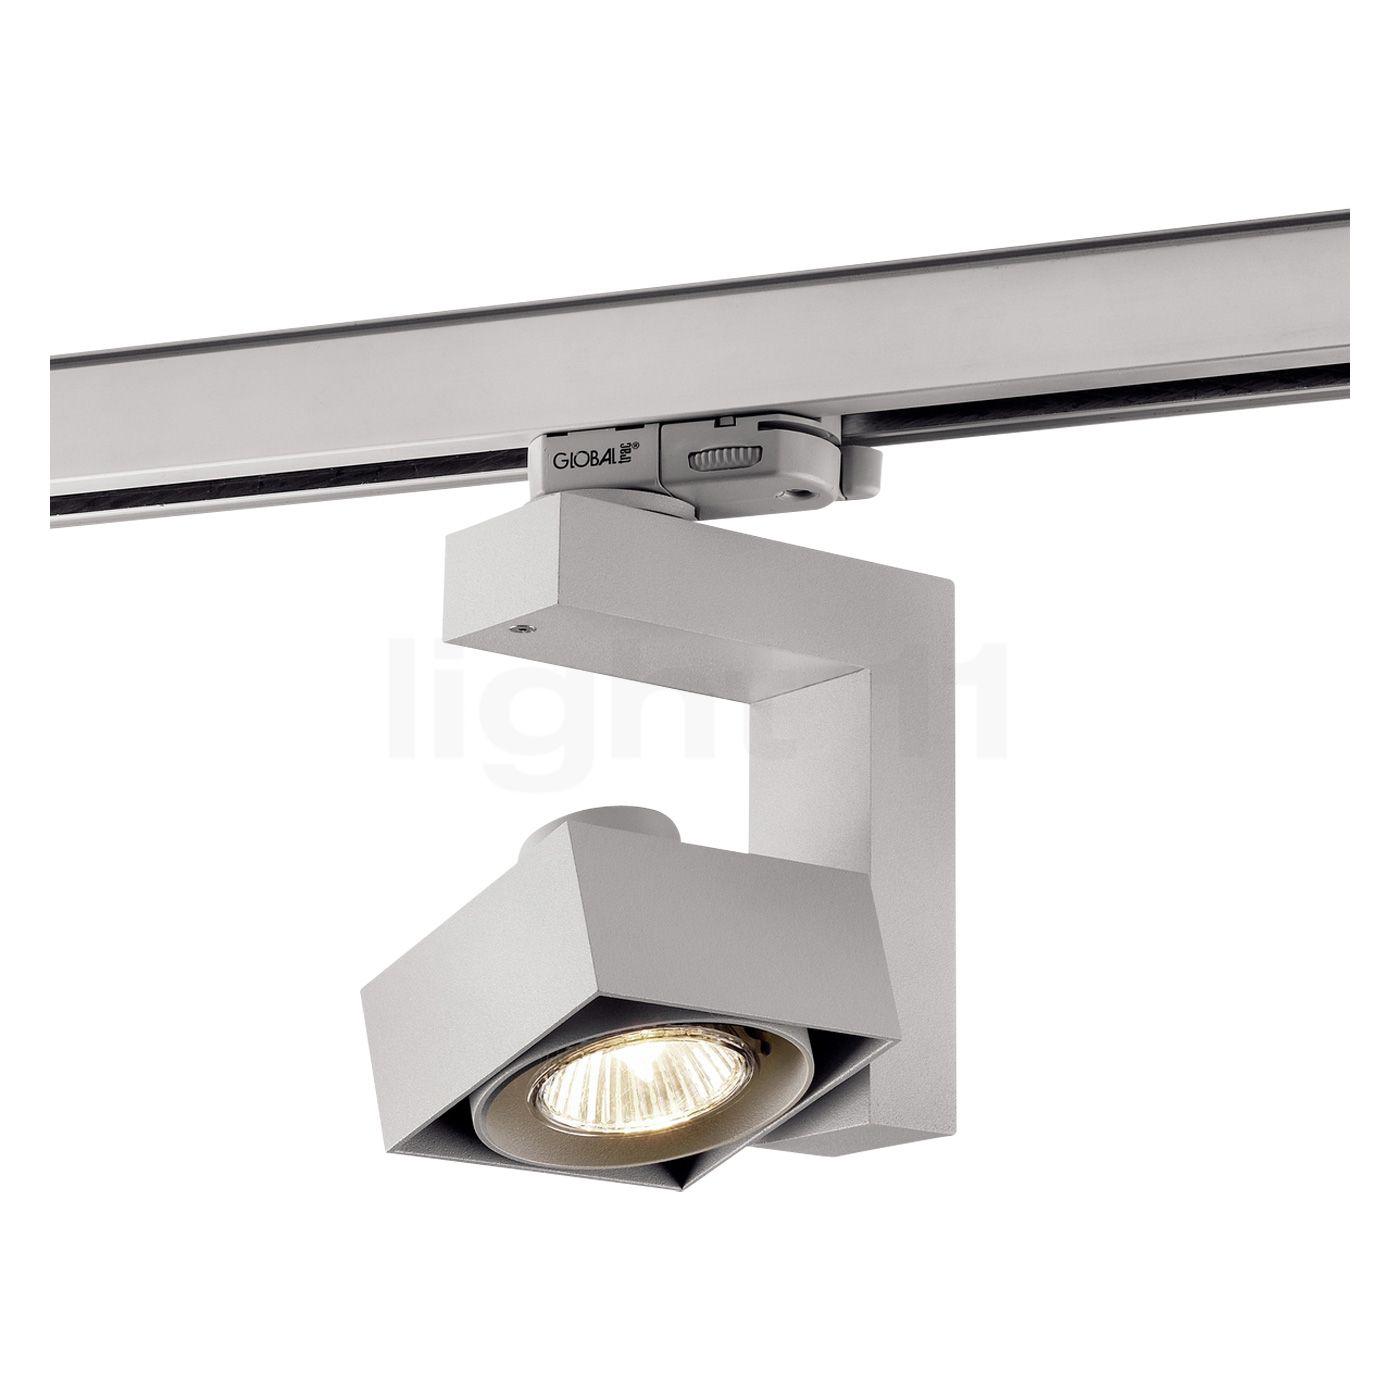 delta light spatio 50 t50 ad deckenleuchte. Black Bedroom Furniture Sets. Home Design Ideas